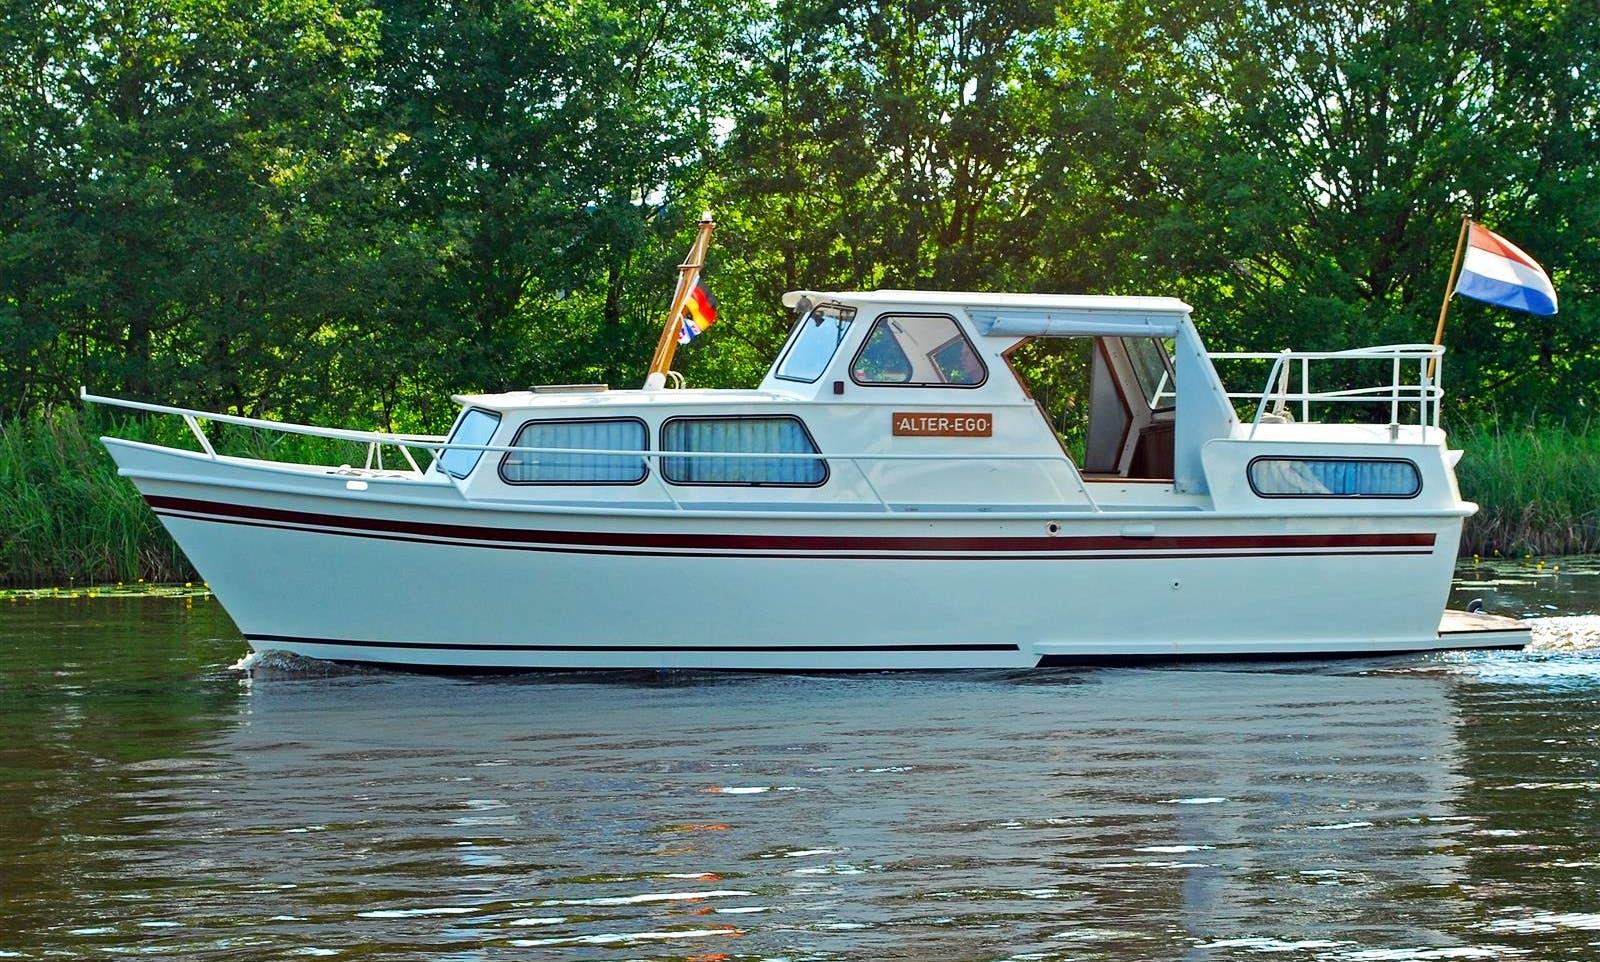 Enjoy Friesland, Netherlands on 30' Motor Yacht